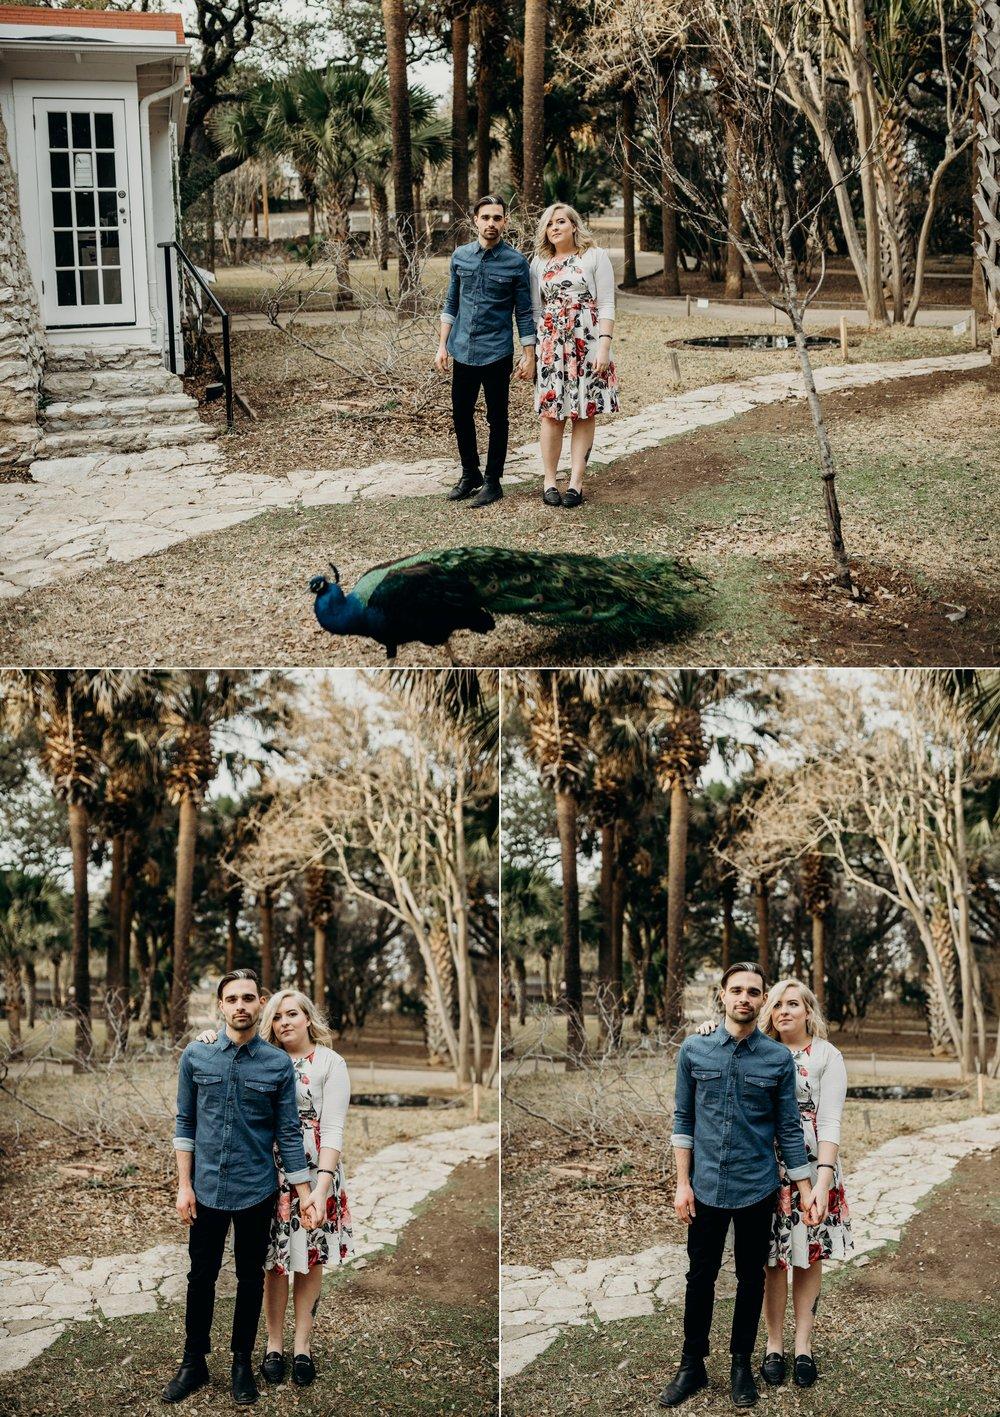 drew-andrew-texas-austin-minnesota-minneapolis-wedding-photographer-destination-elopement-intimate-adventurous_0101.jpg